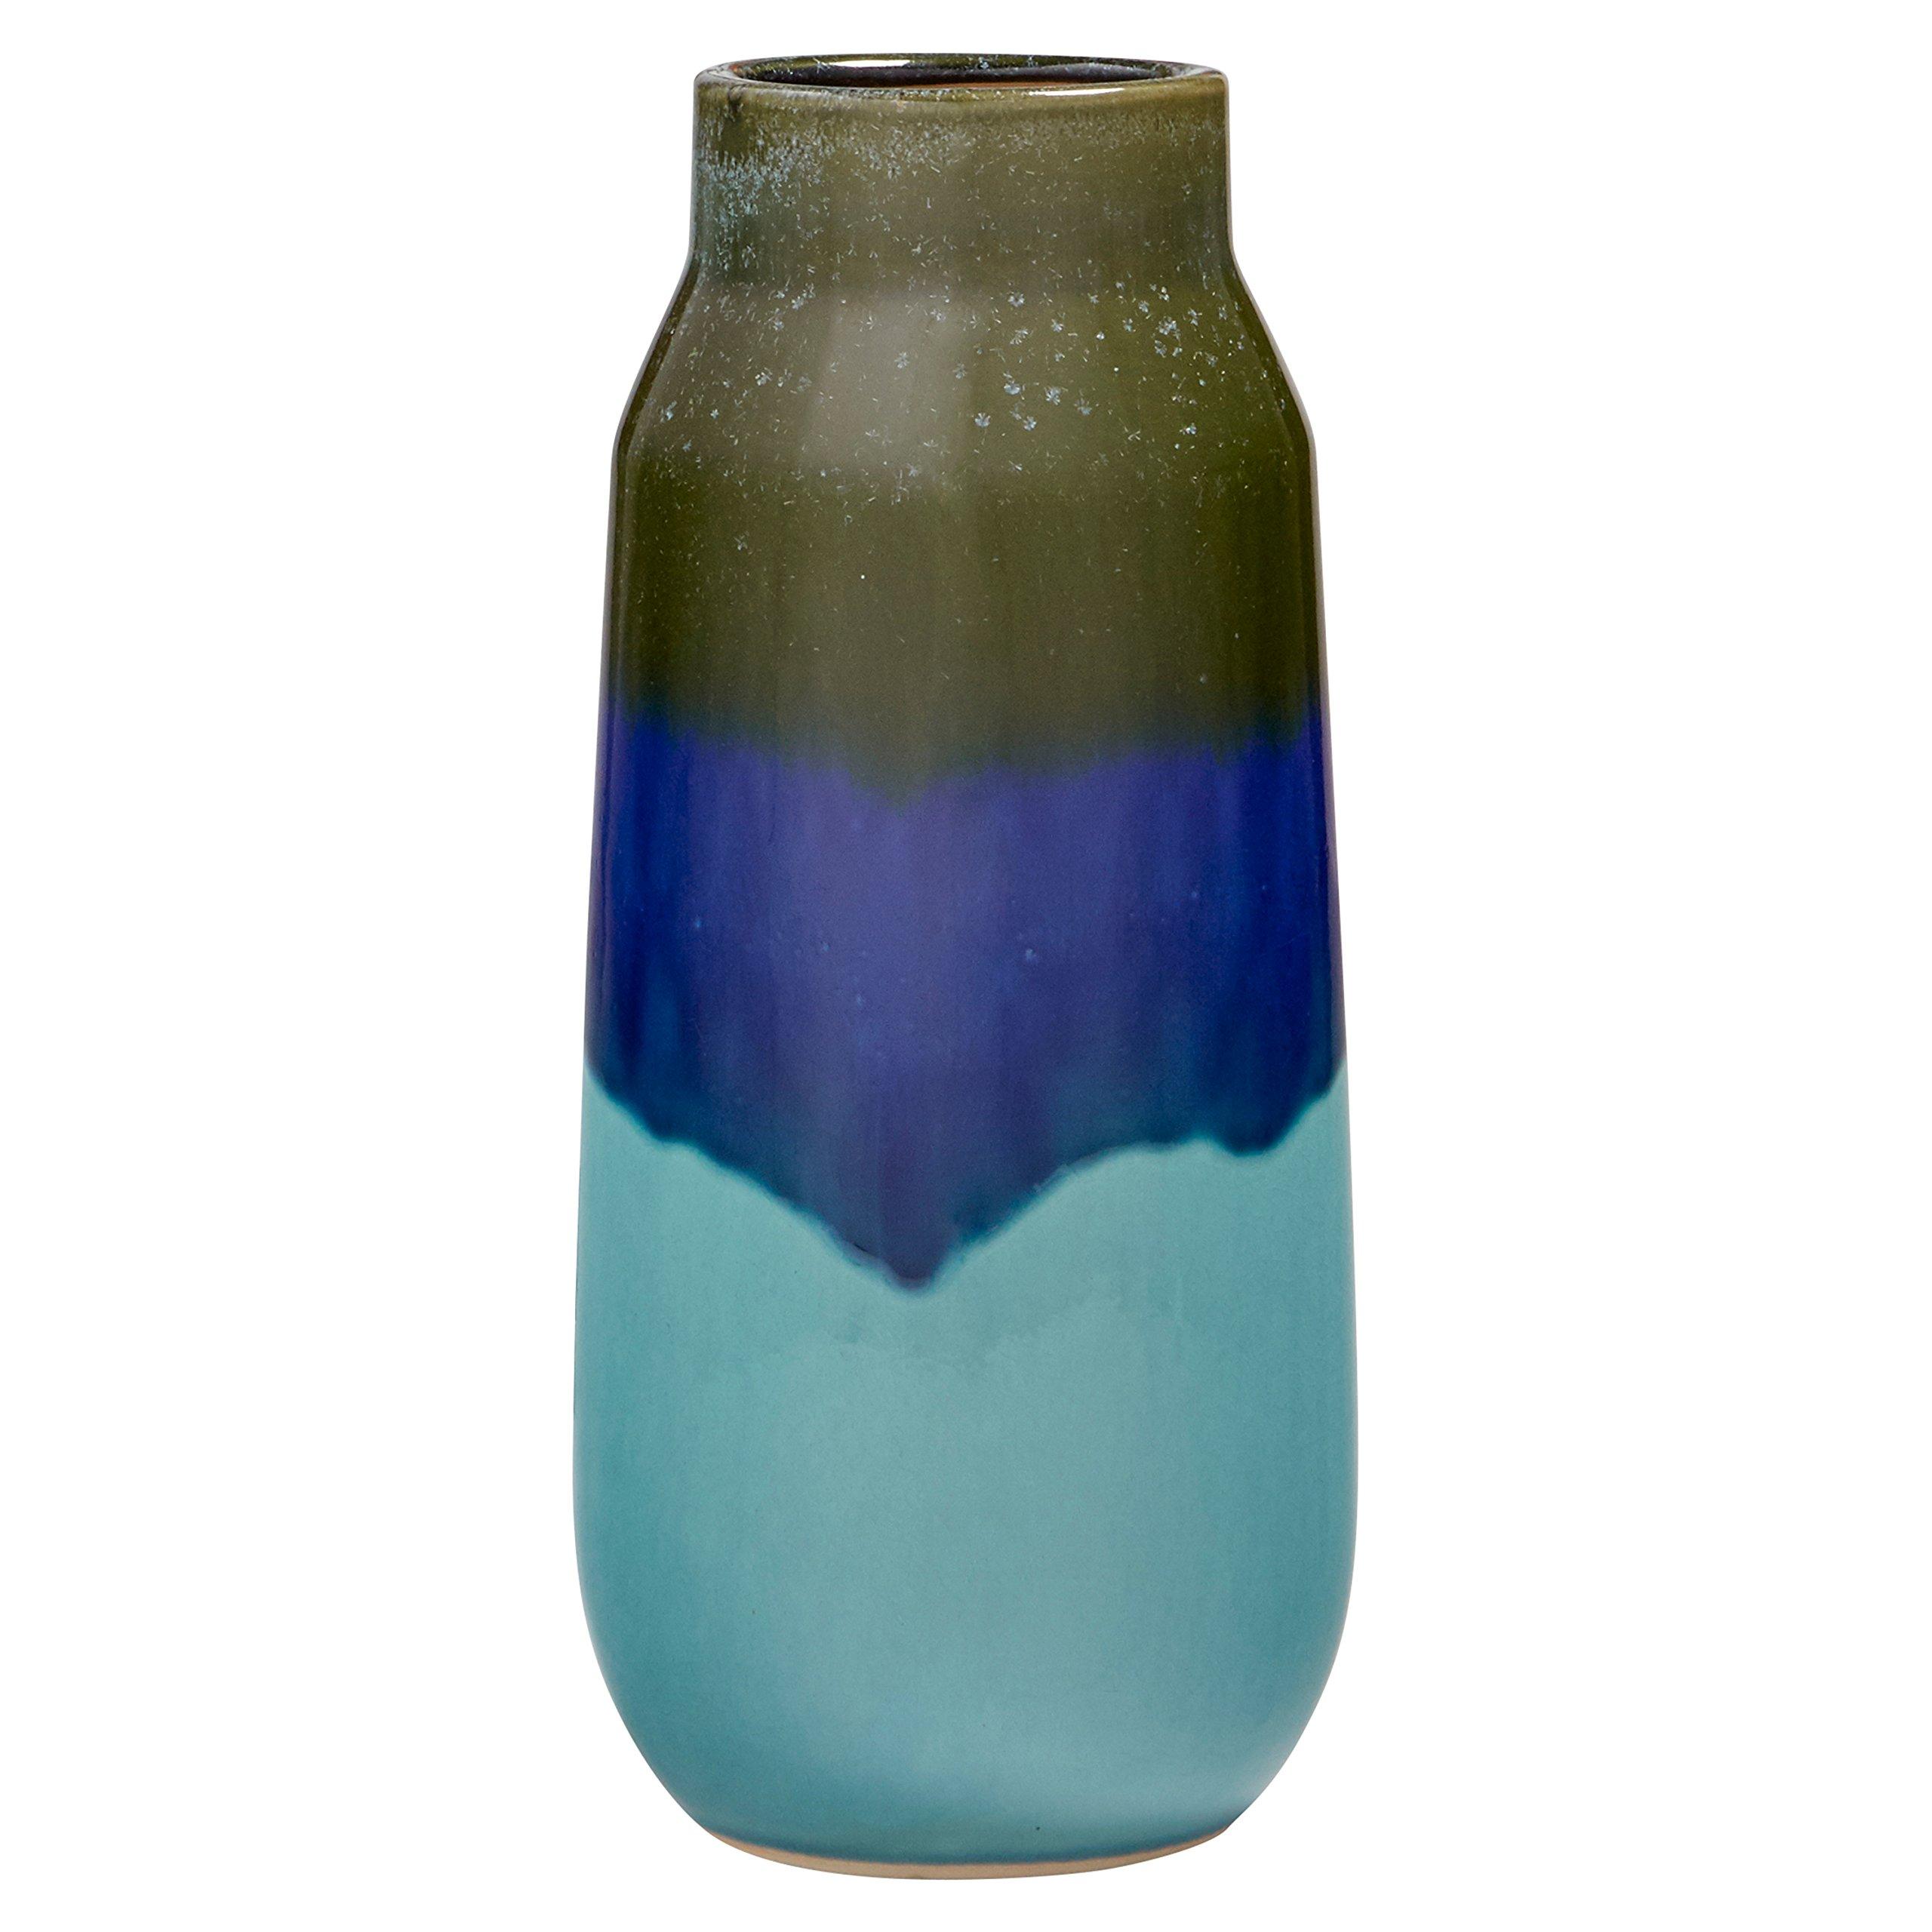 251 & Tall Centerpiece Vases: Amazon.com